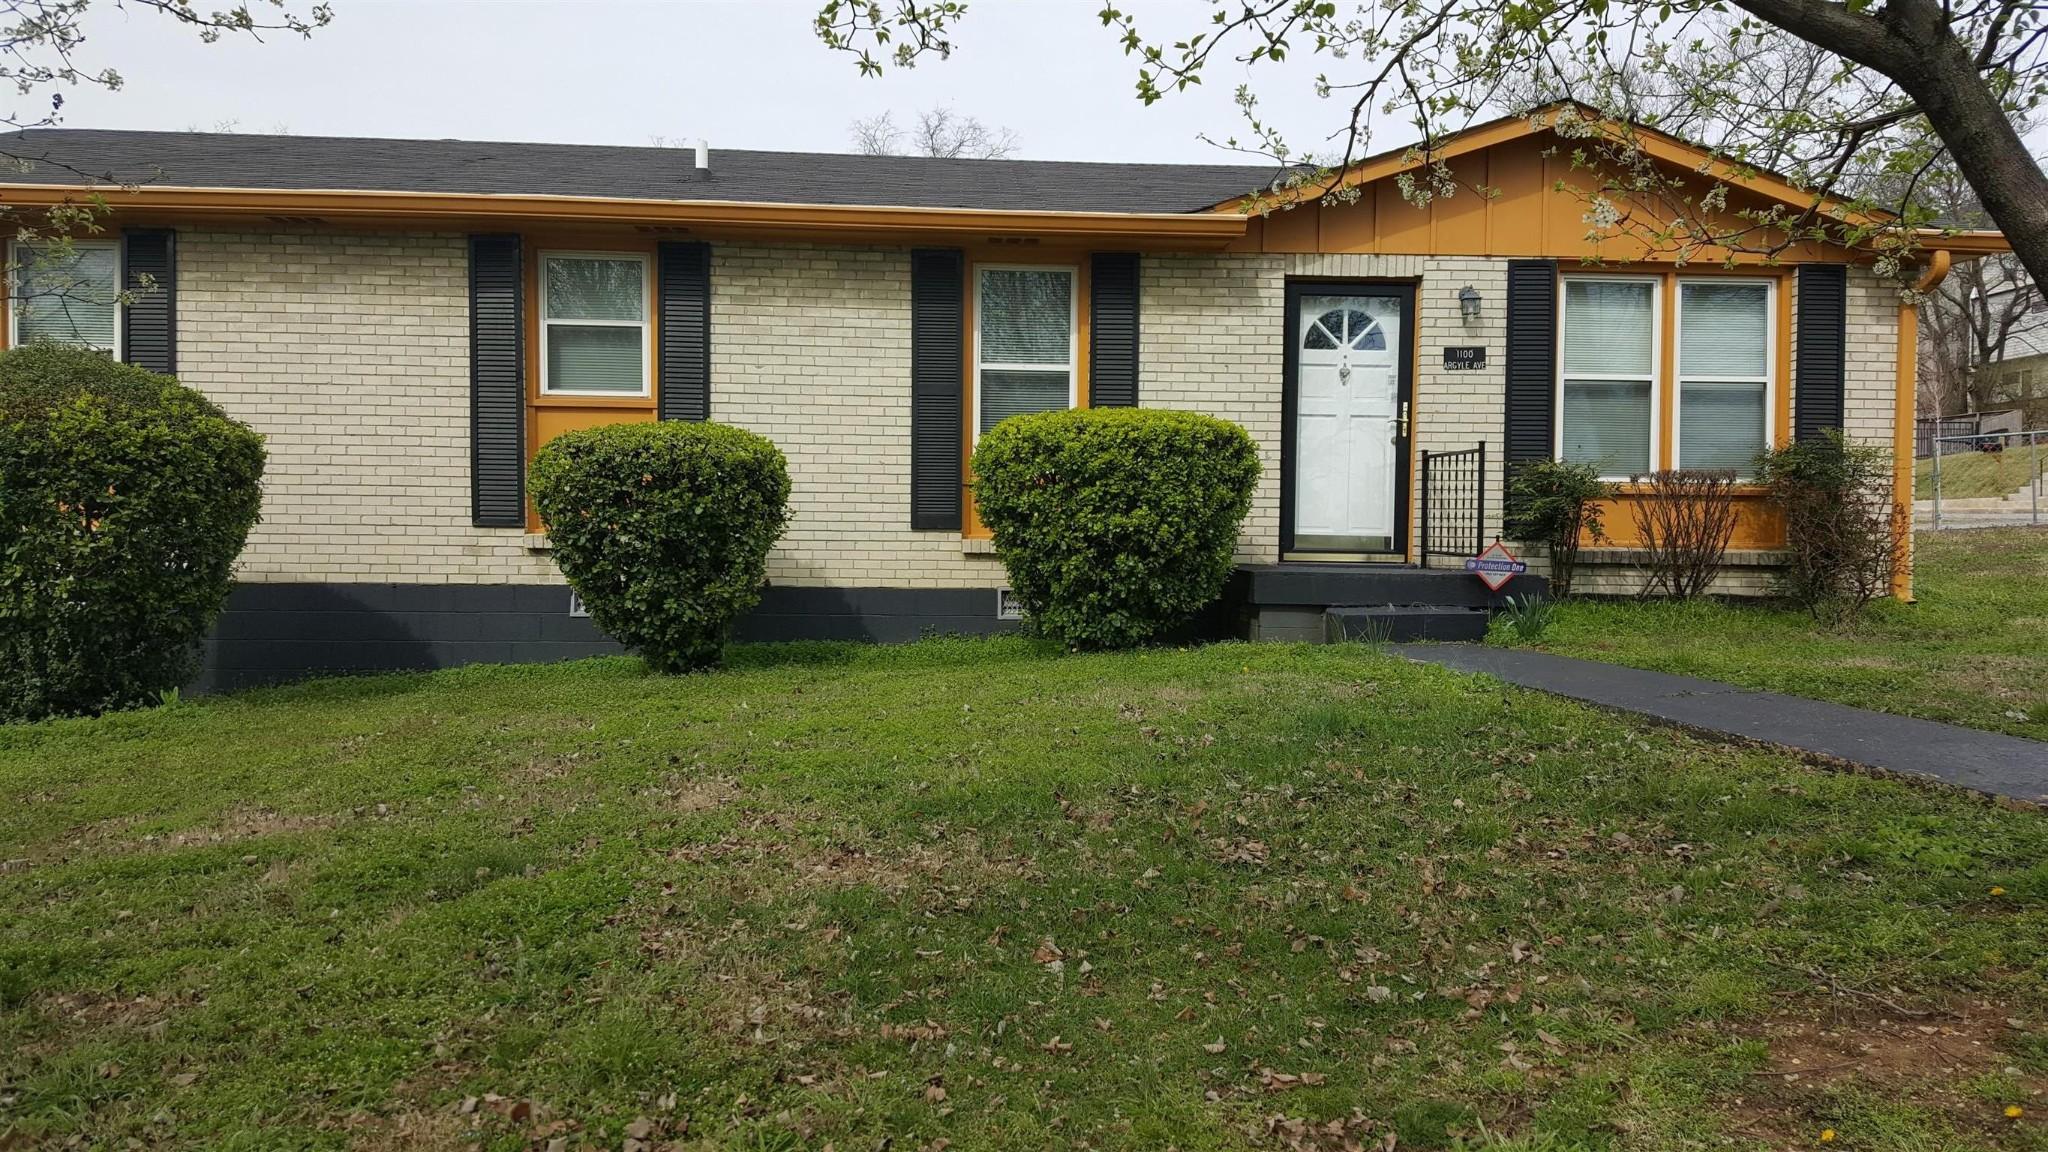 1100 Argyle Ave, S, Nashville, TN 37203 - Nashville, TN real estate listing